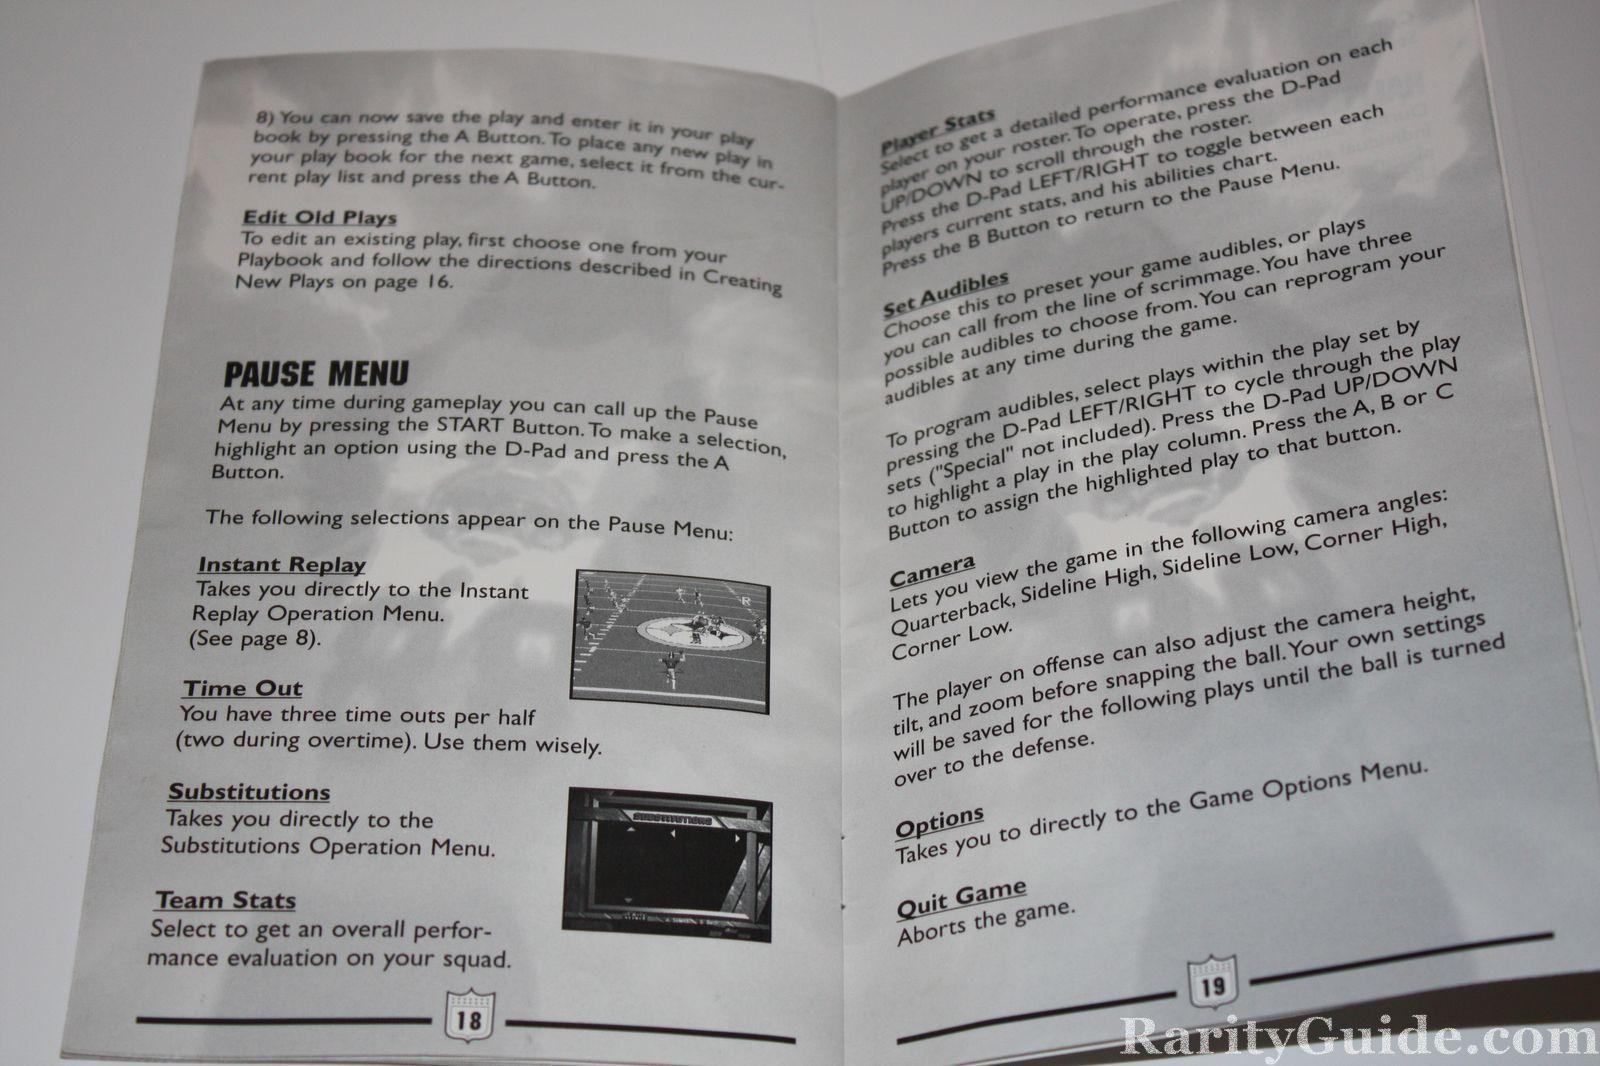 1995 saturn repair manual daily instruction manual guides u2022 rh testingwordpress co 1993 saturn sl2 owners manual 1993 saturn sl owners manual